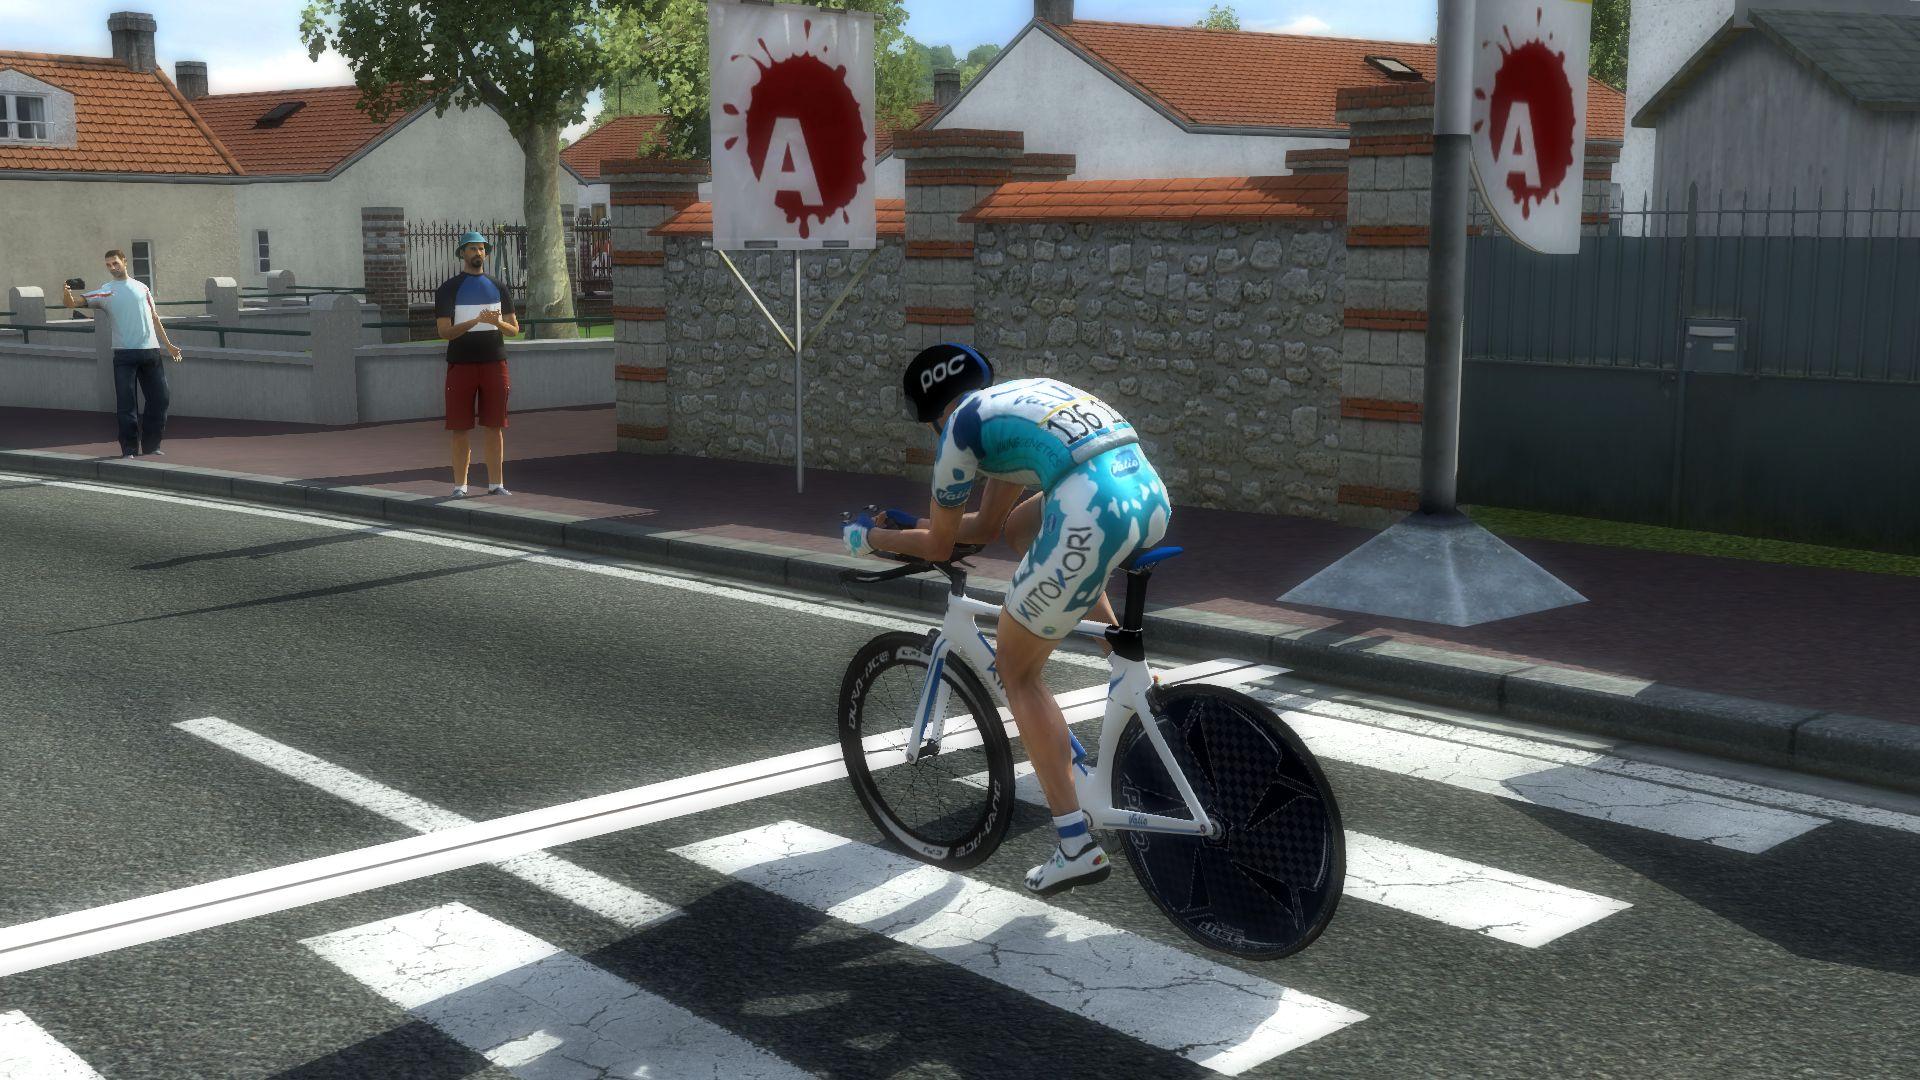 pcmdaily.com/images/mg/2019/Races/C1/Bayern/S4/mg19_bay_s04_41.jpg